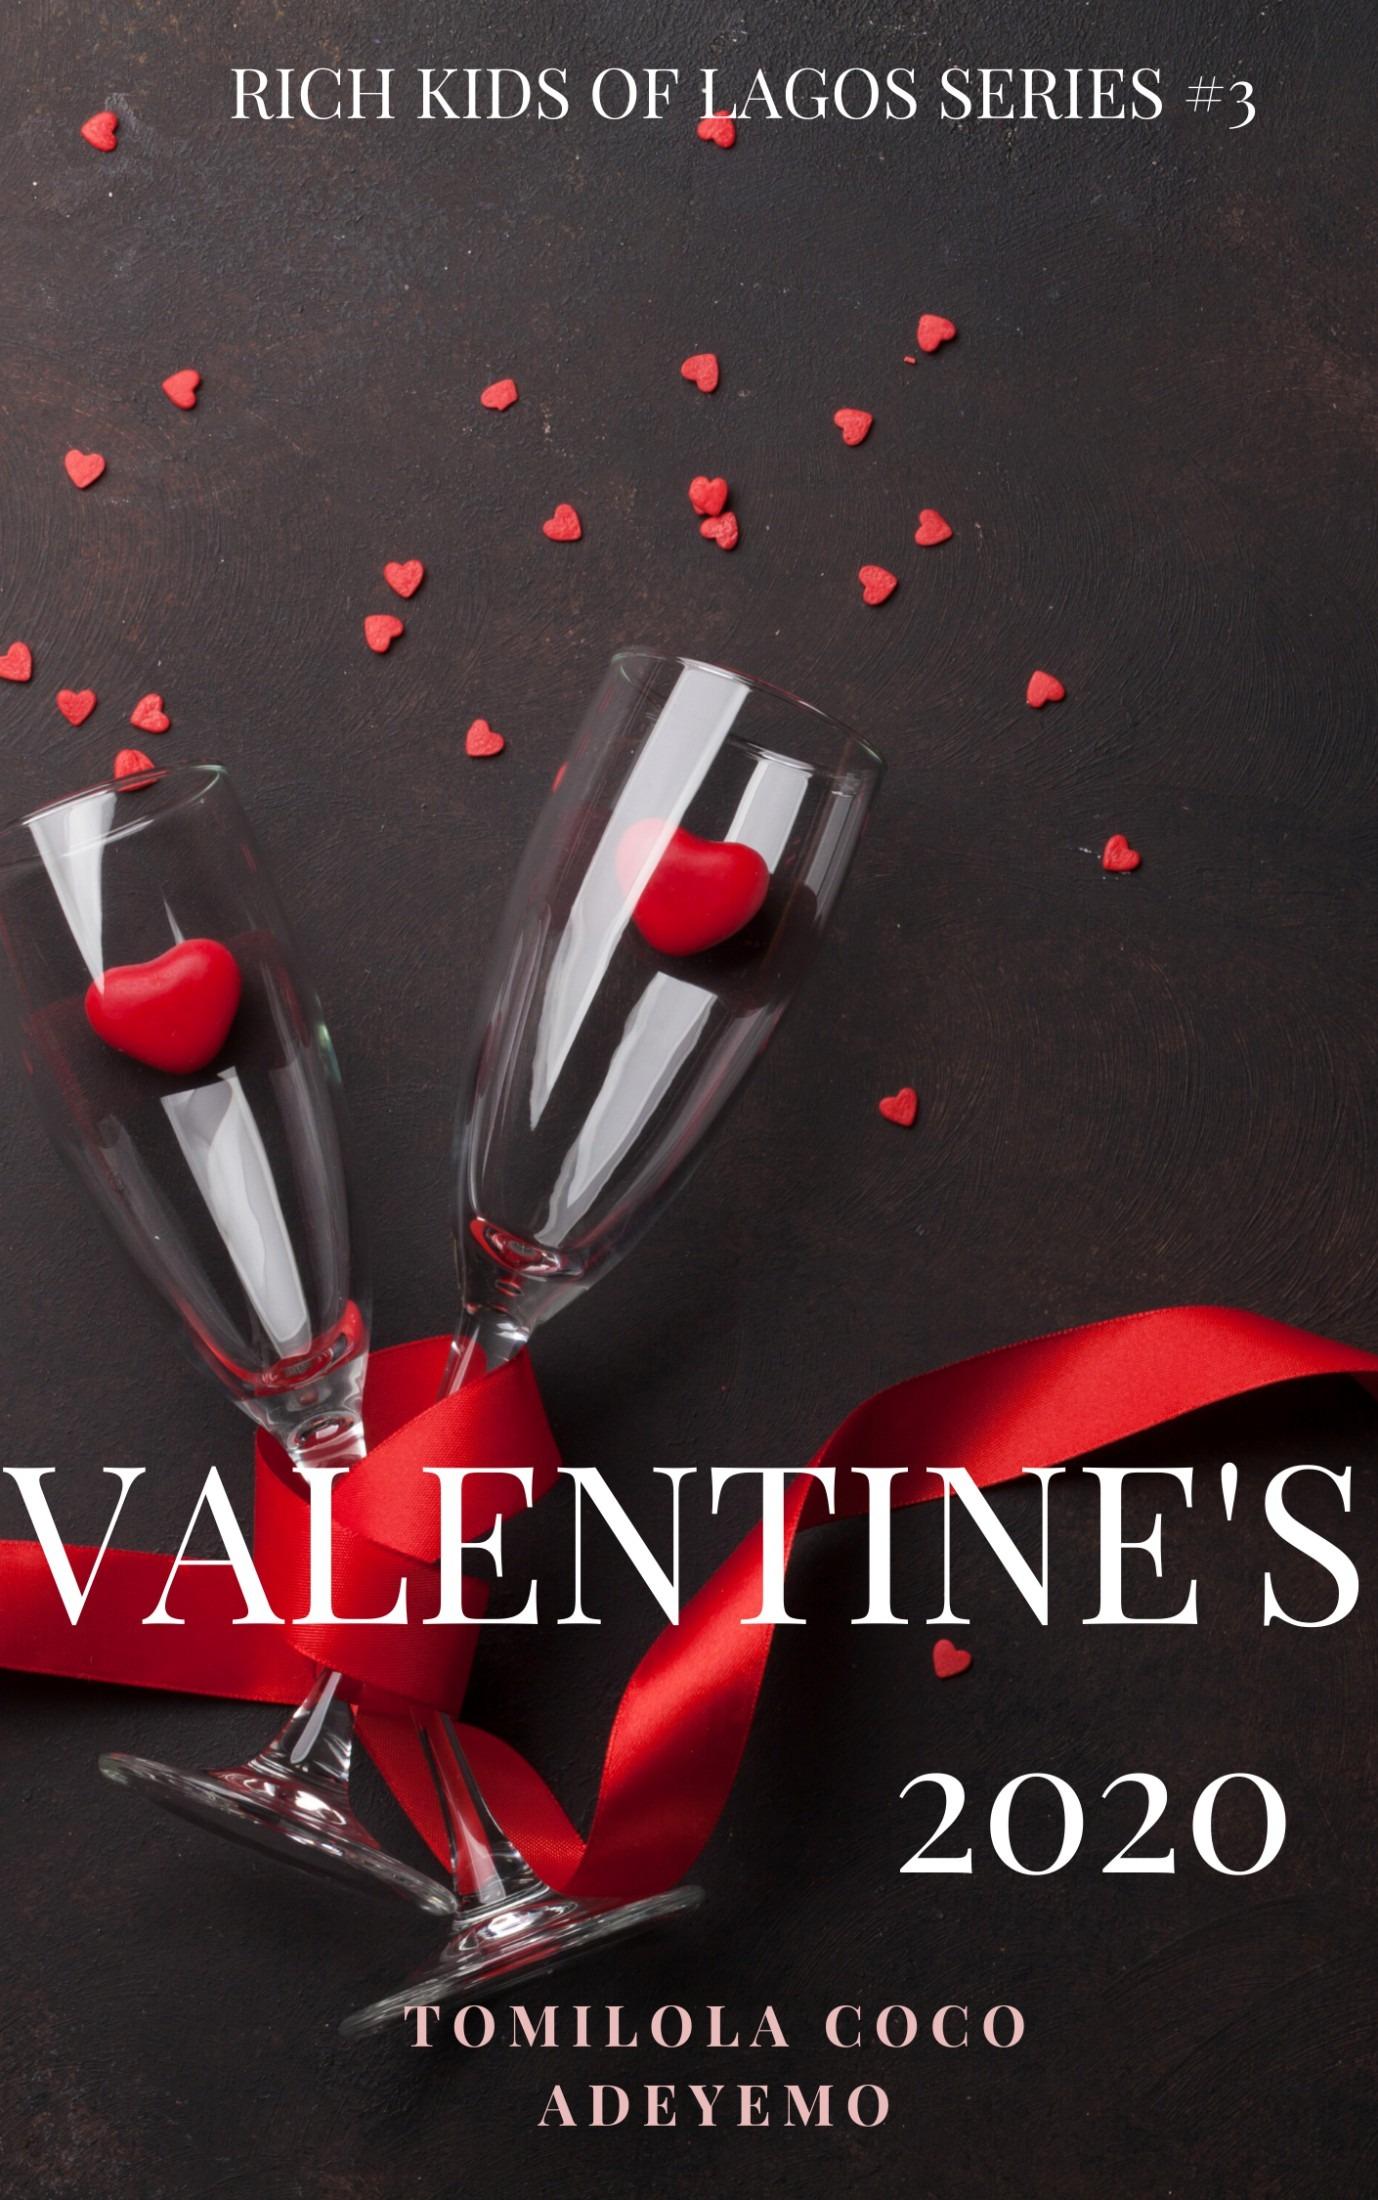 Valentine's 2020